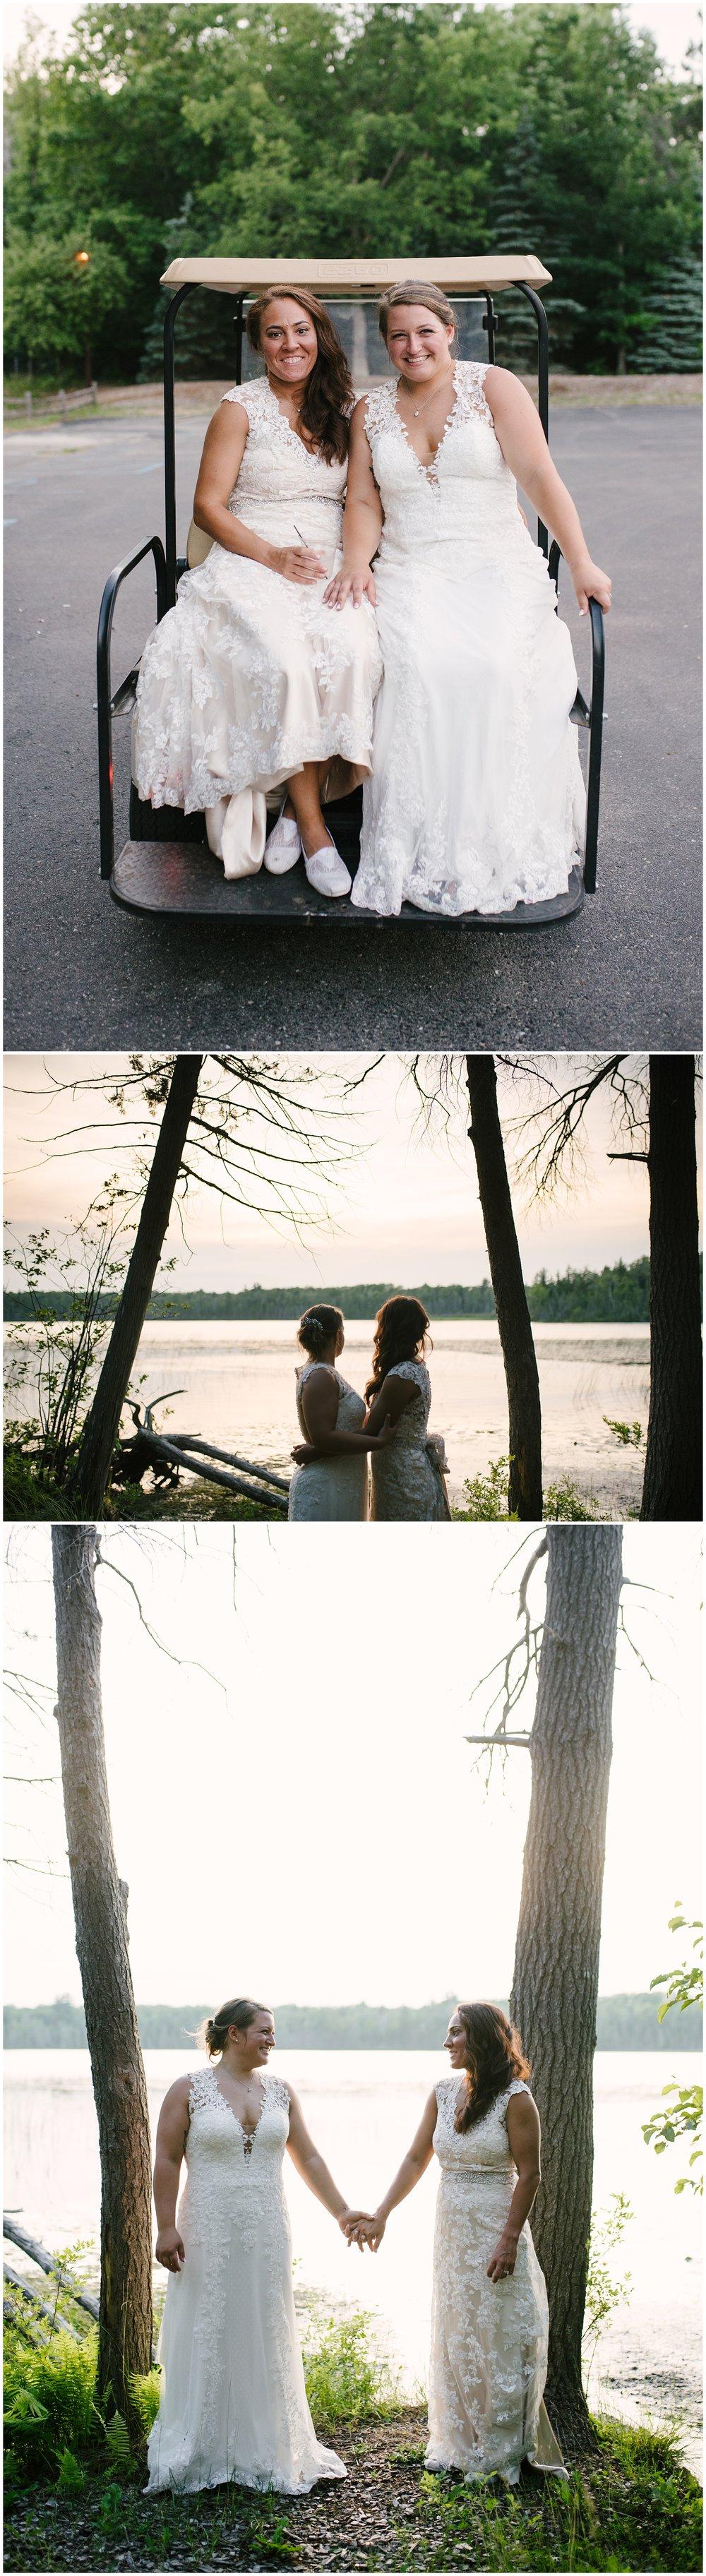 annajophoto-102.jpg